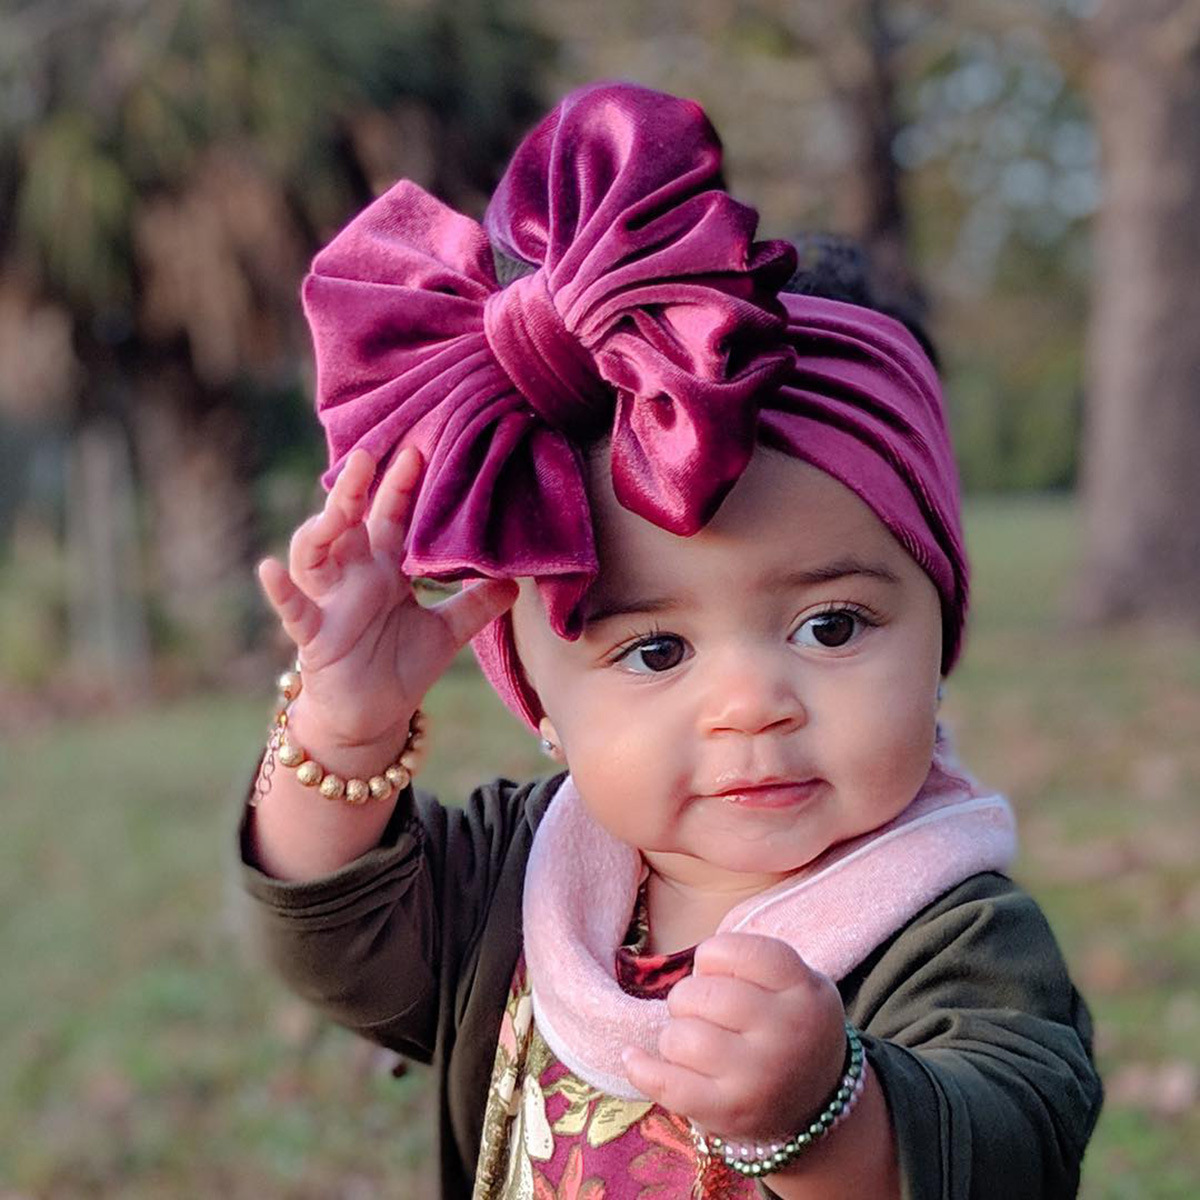 Newborn Velet Bow Children Hairband Oversized Bow Knot Baby Girls Headband Infant Kids Hair Accessory Girls Supper Wide Turban